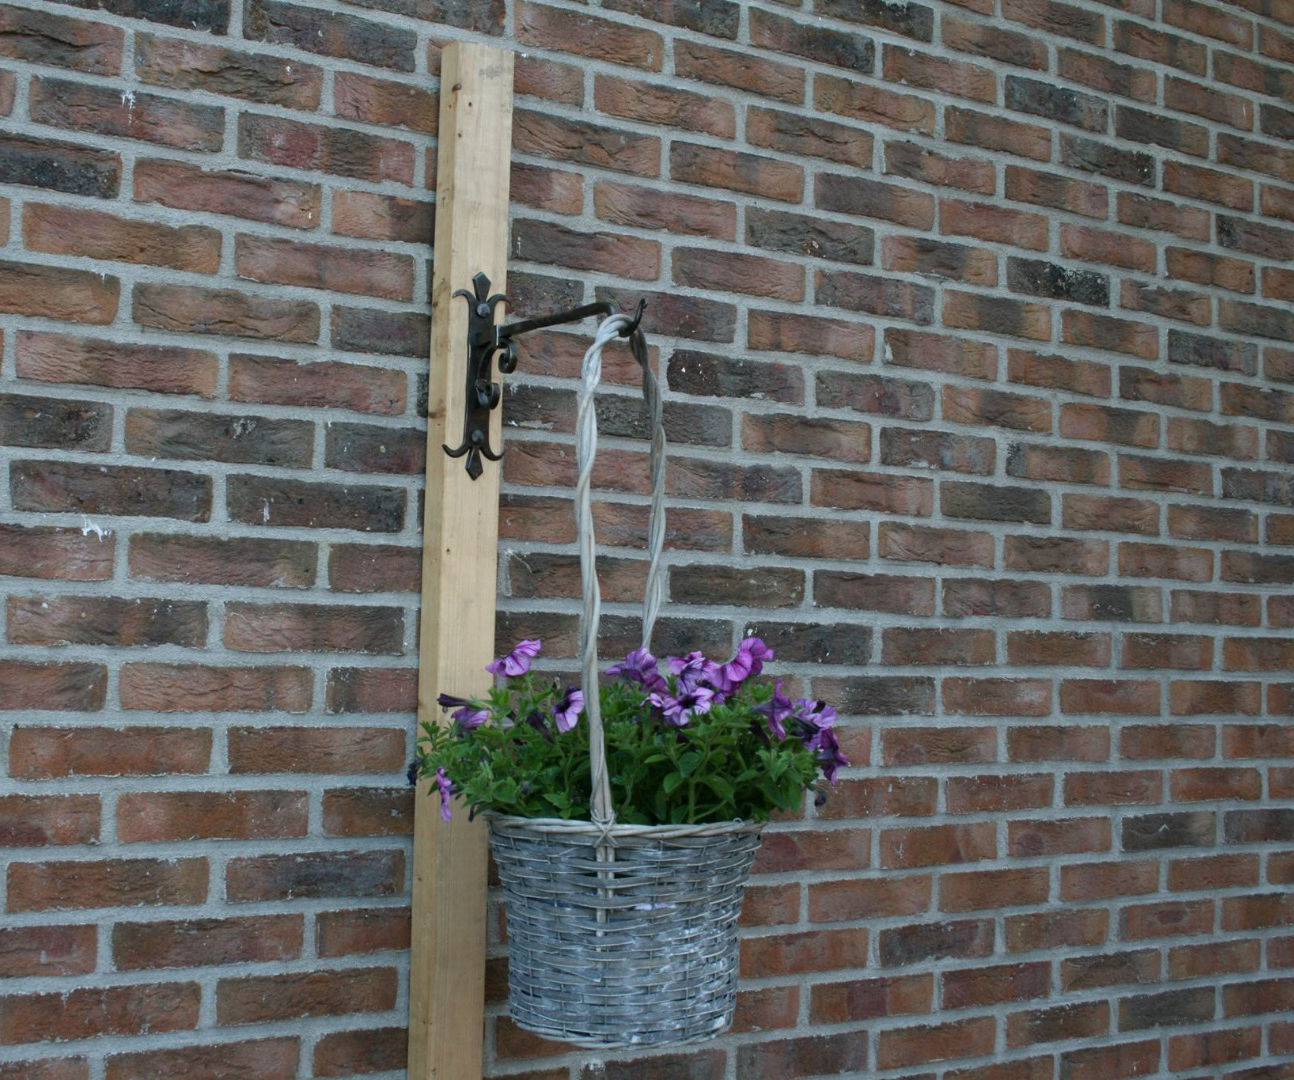 Forging a plant basket hanger of 3 railroad spikes